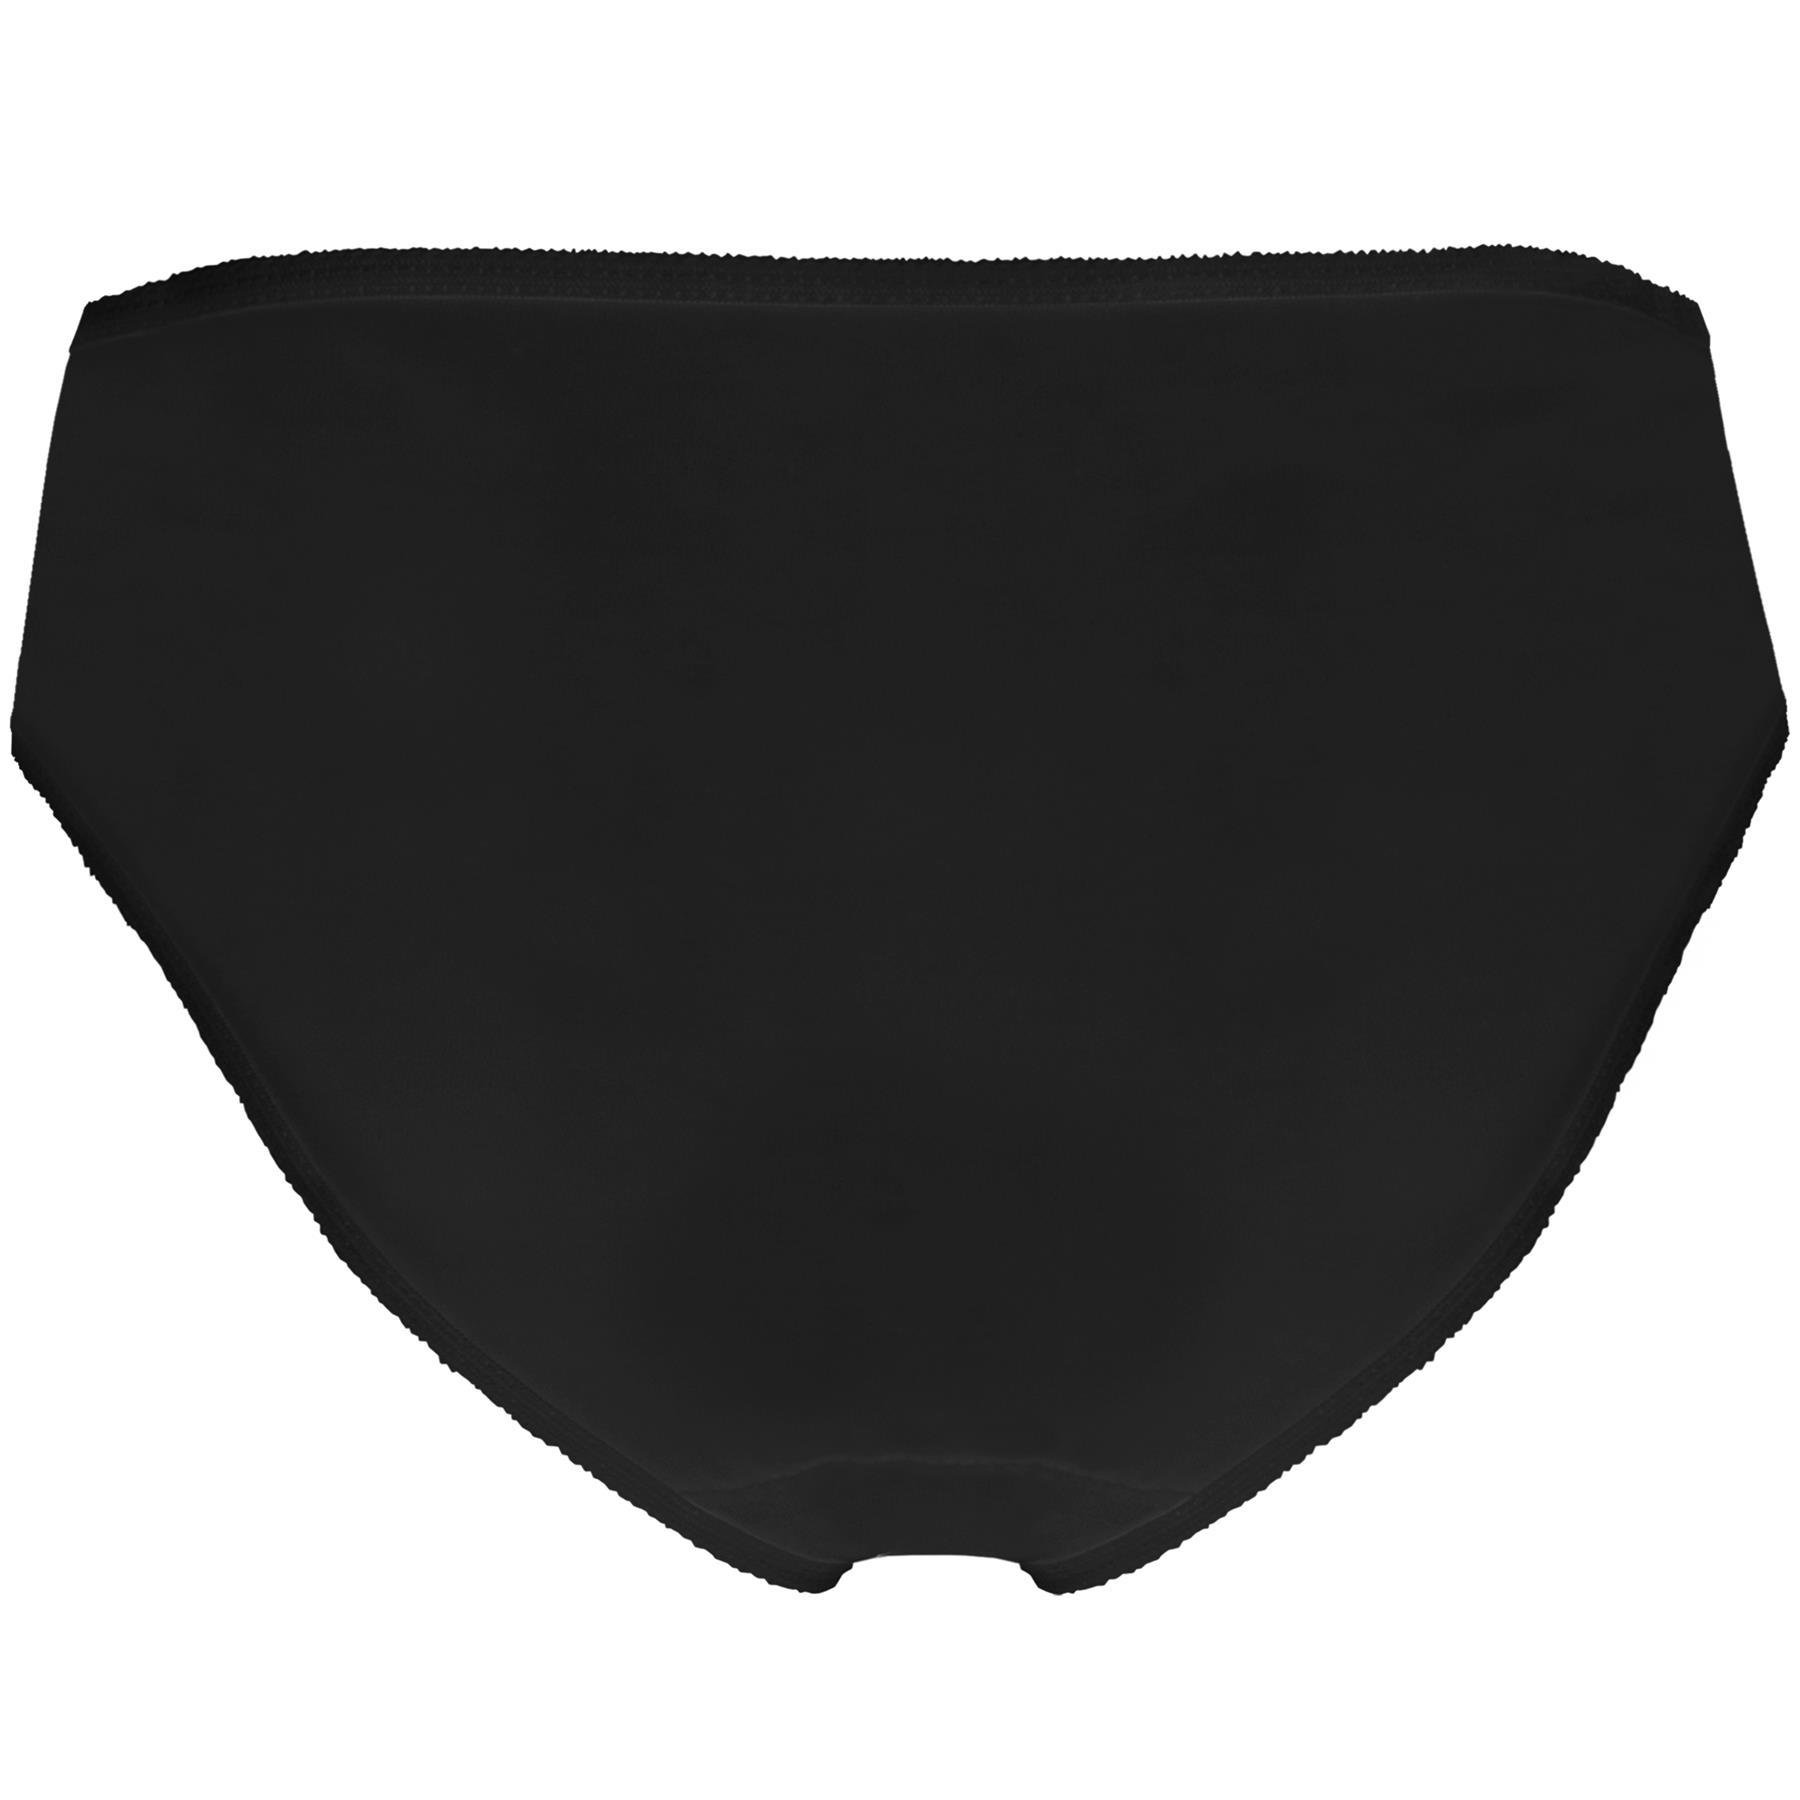 3 Pack Ladies Bikini Briefs Panties Womens Cotton Knickers Underwear Size 10-18